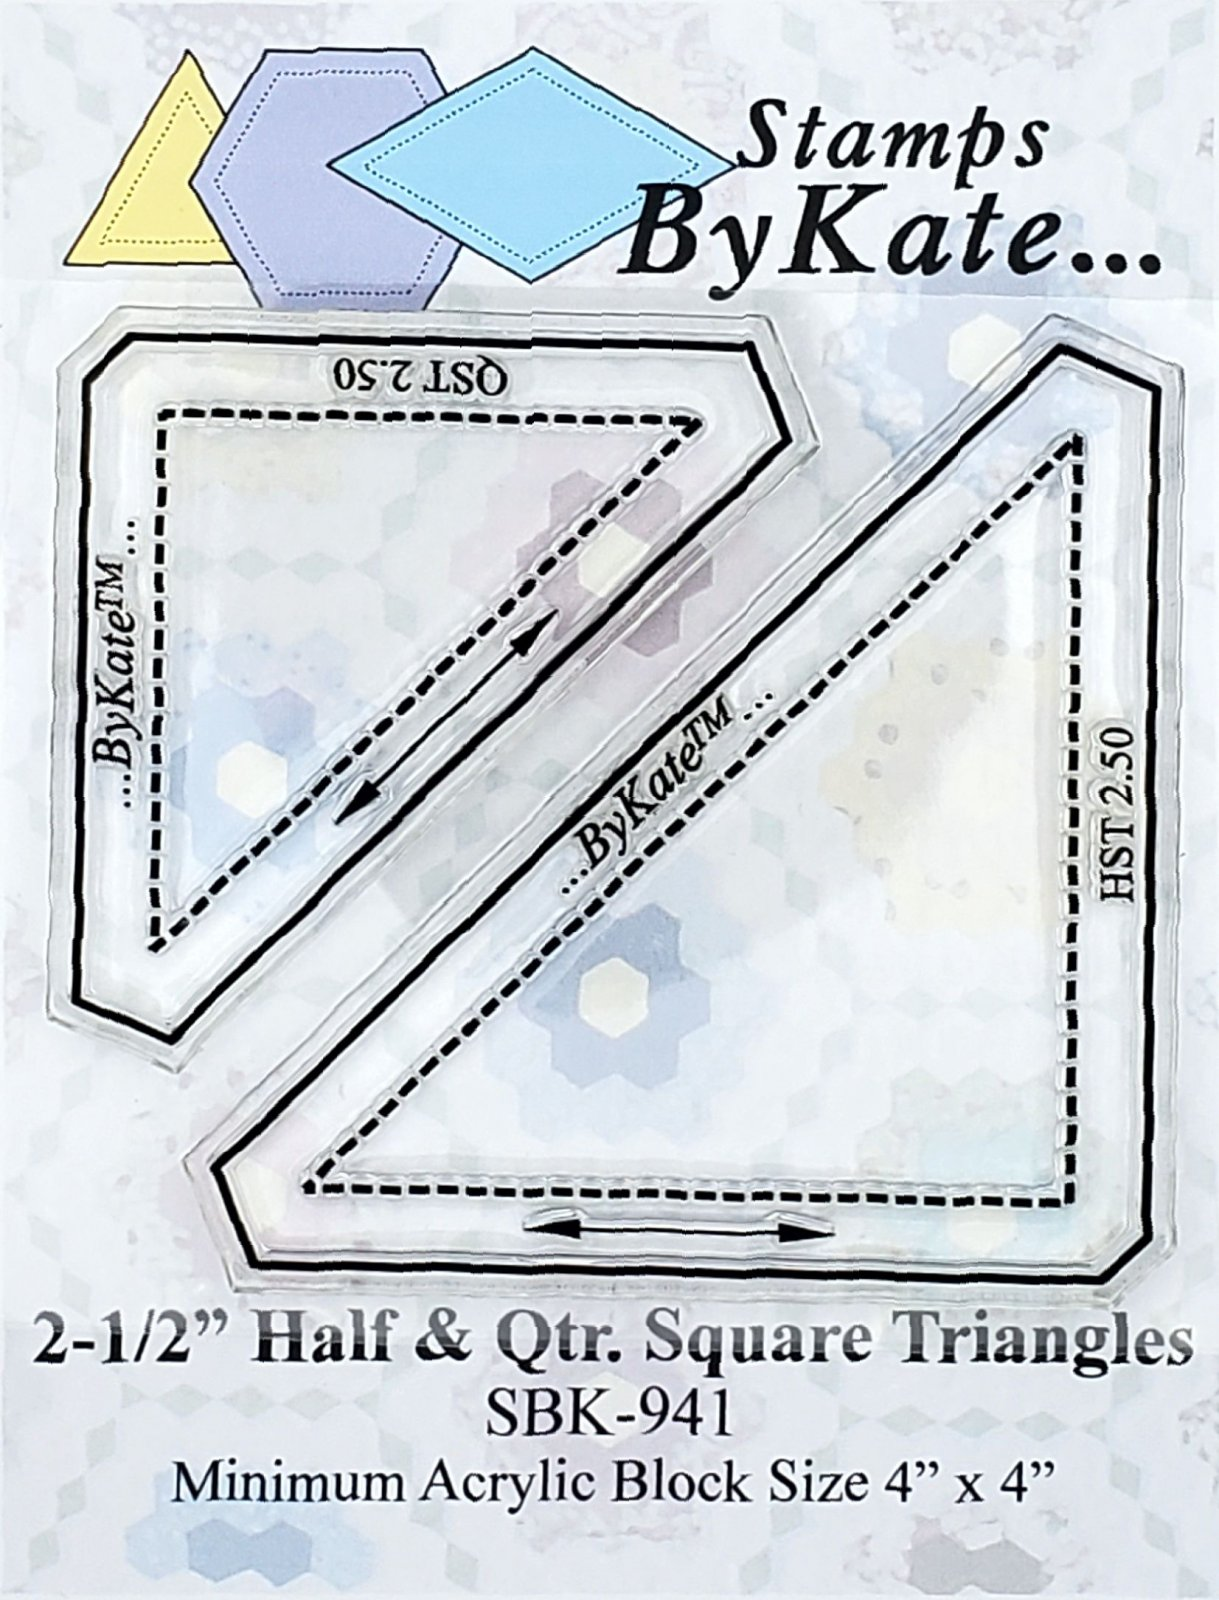 Half & Quarter Square Triangle Sets (QST & HST)